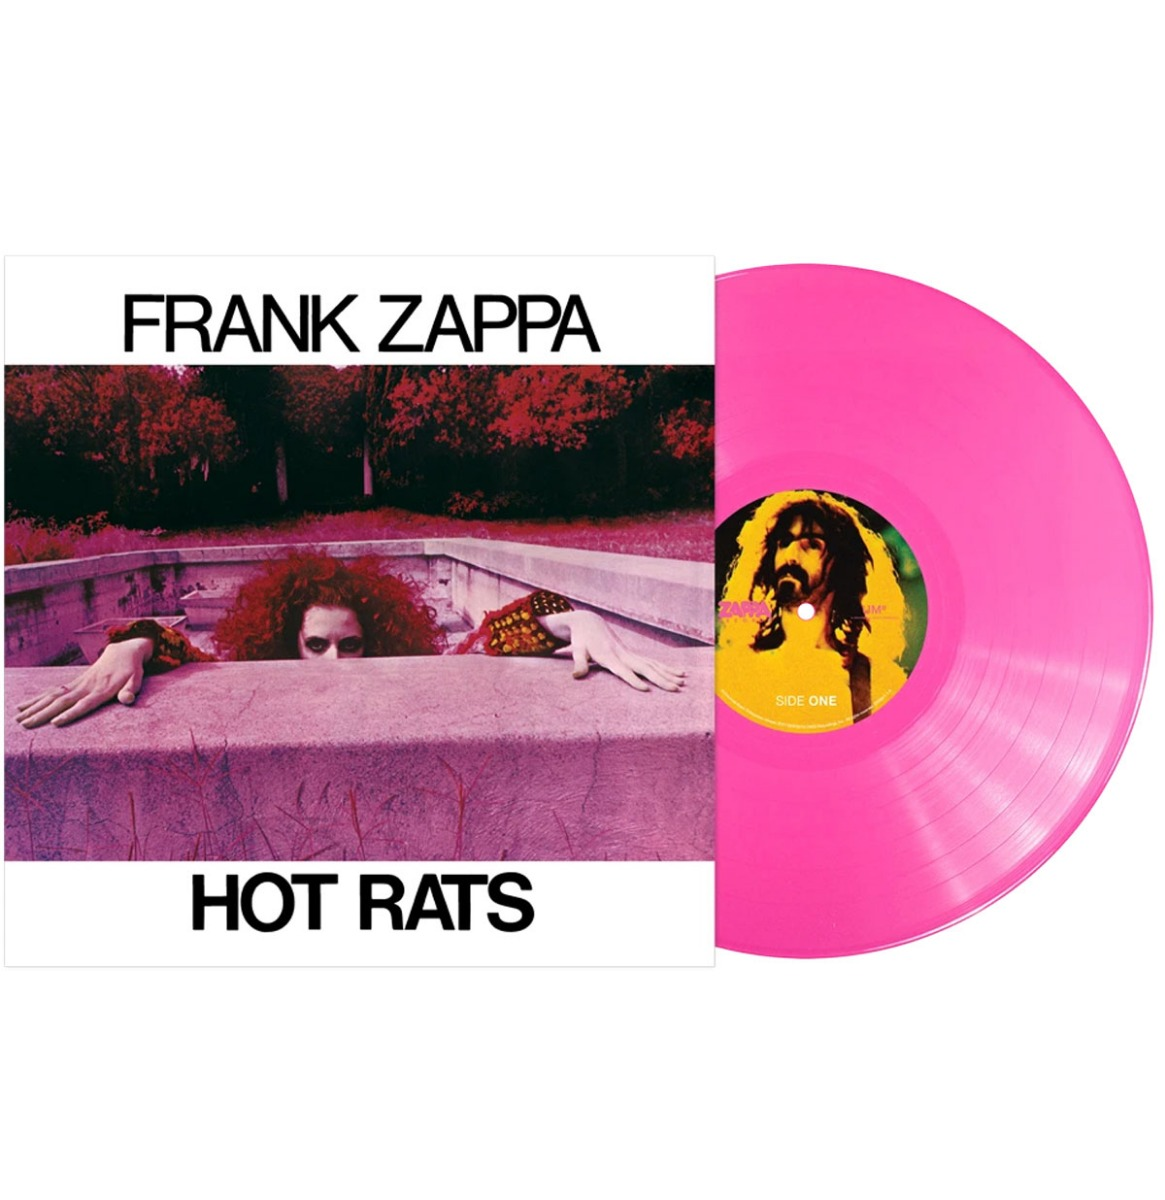 Frank Zappa - Hot Rats LP Beperkte Oplage